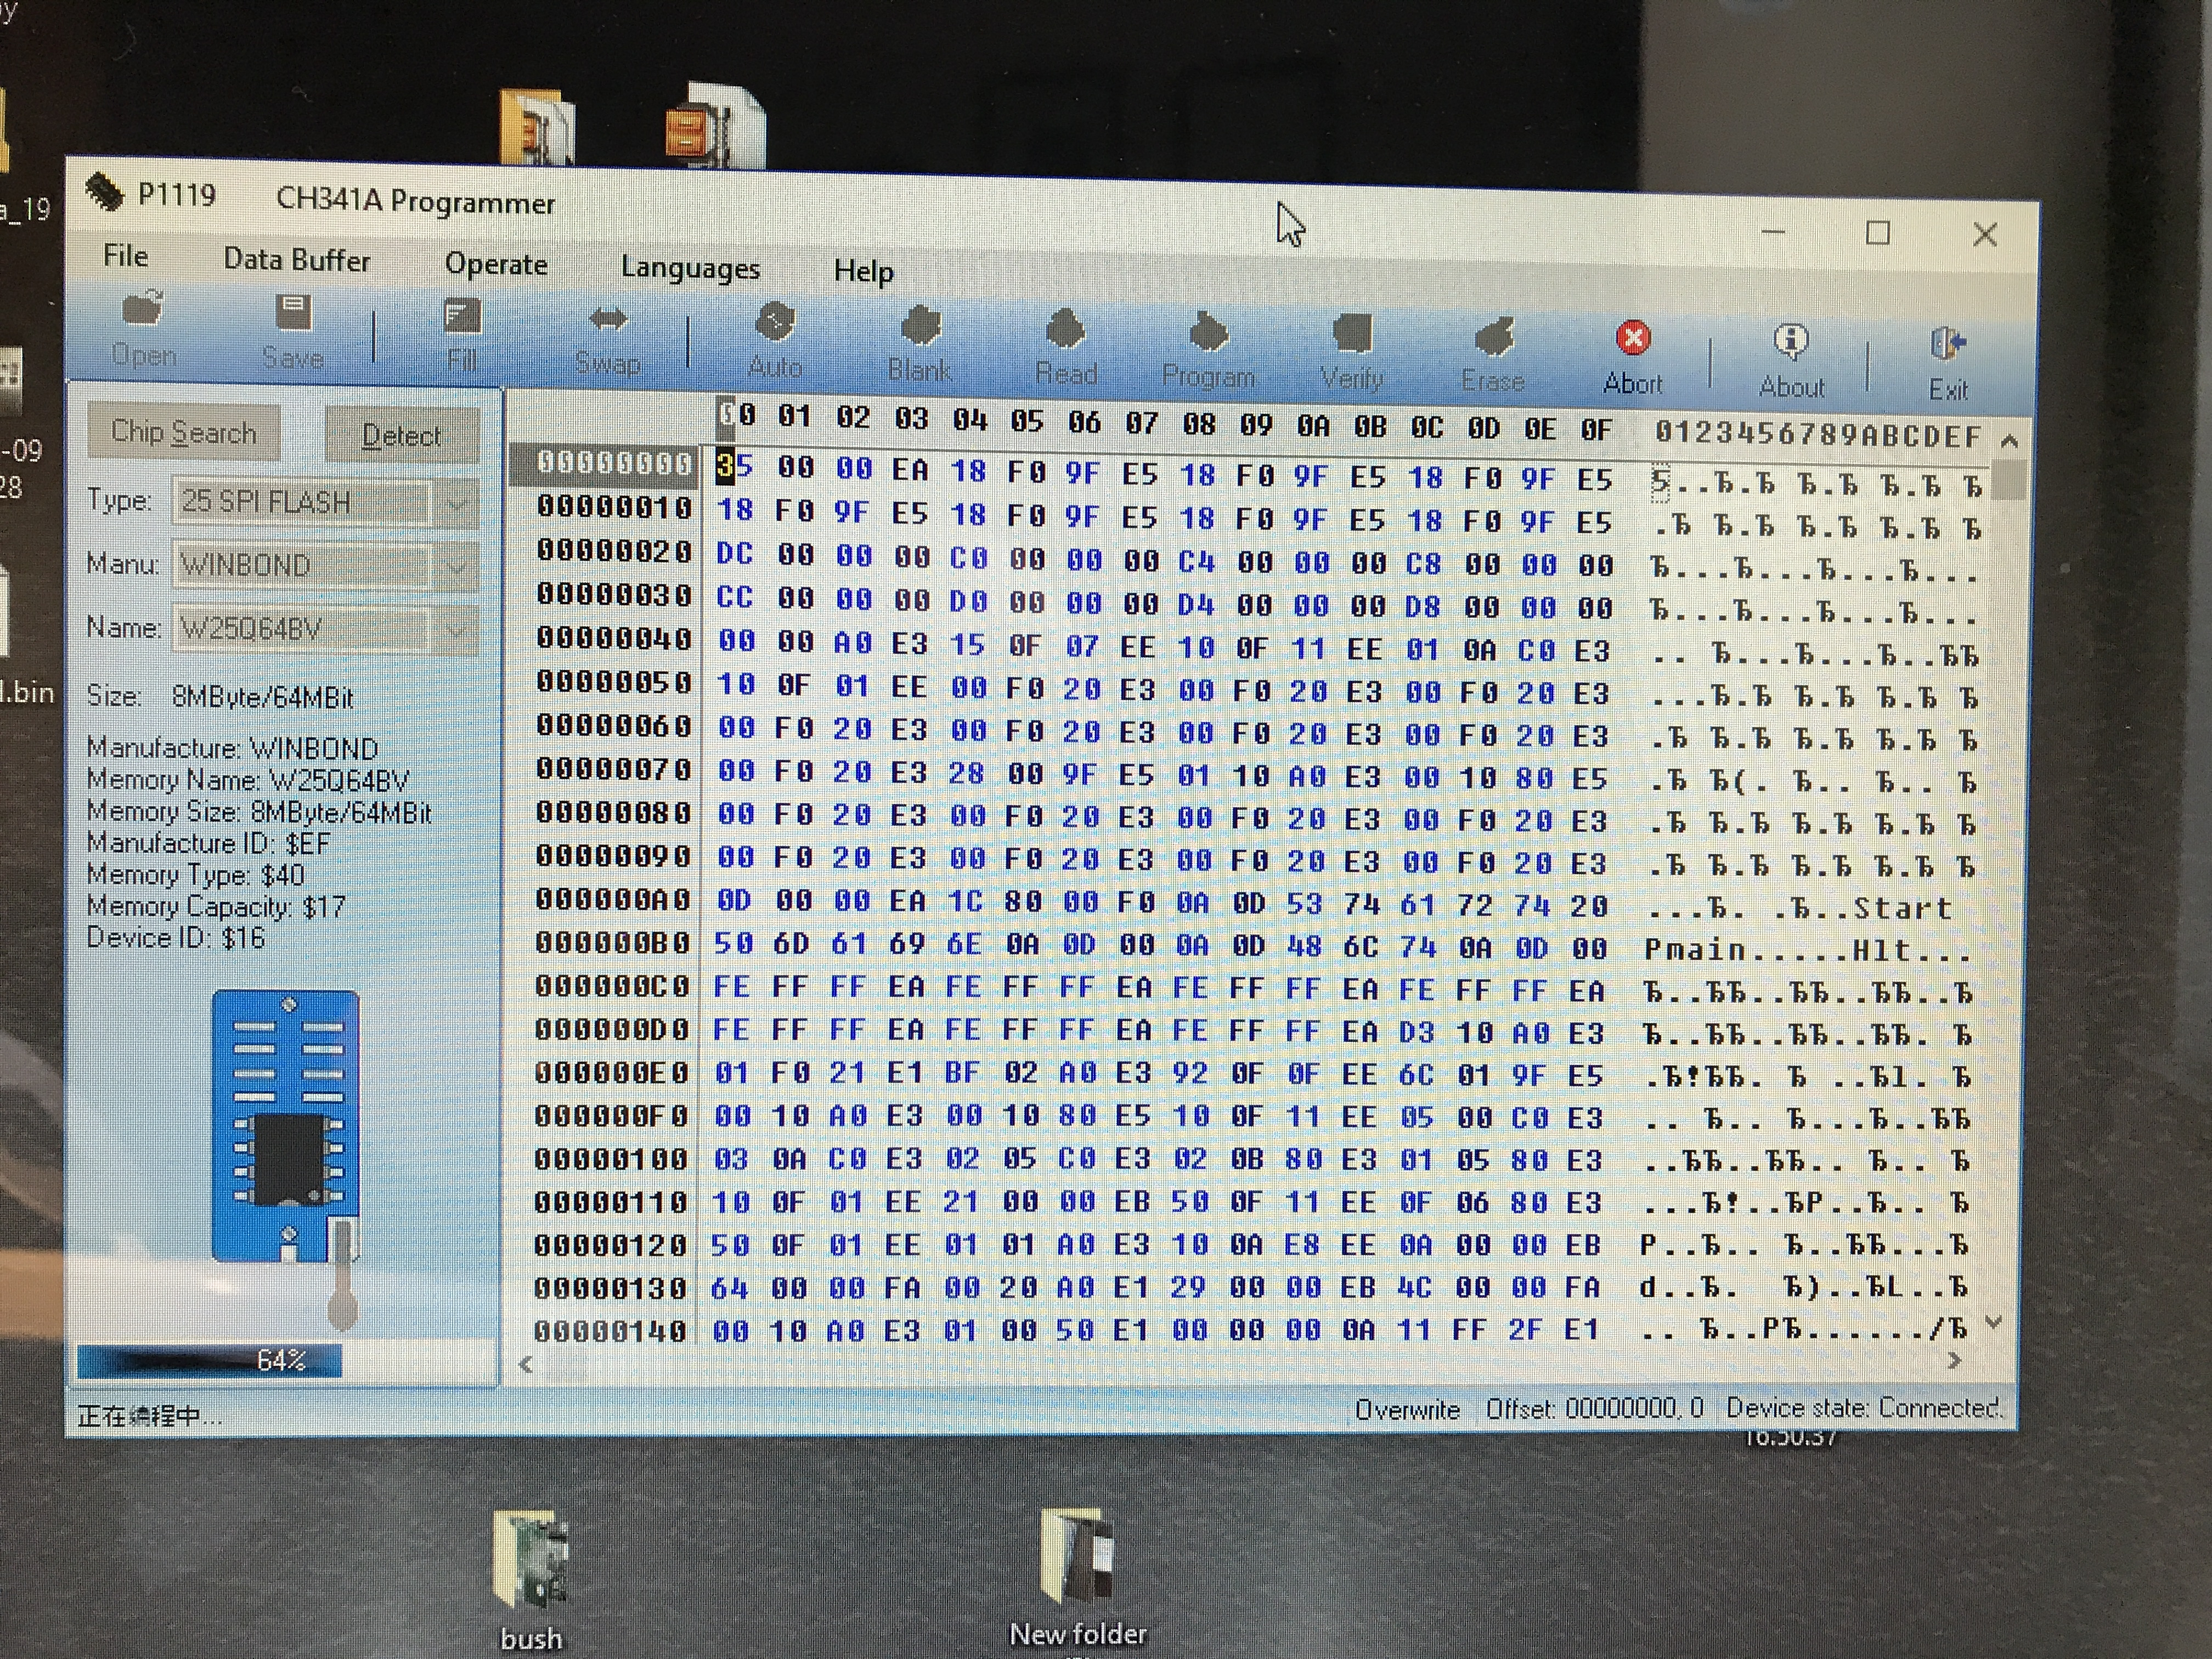 Rozwiązano] - BUSH: LED19134HDDVD flashing 5 times